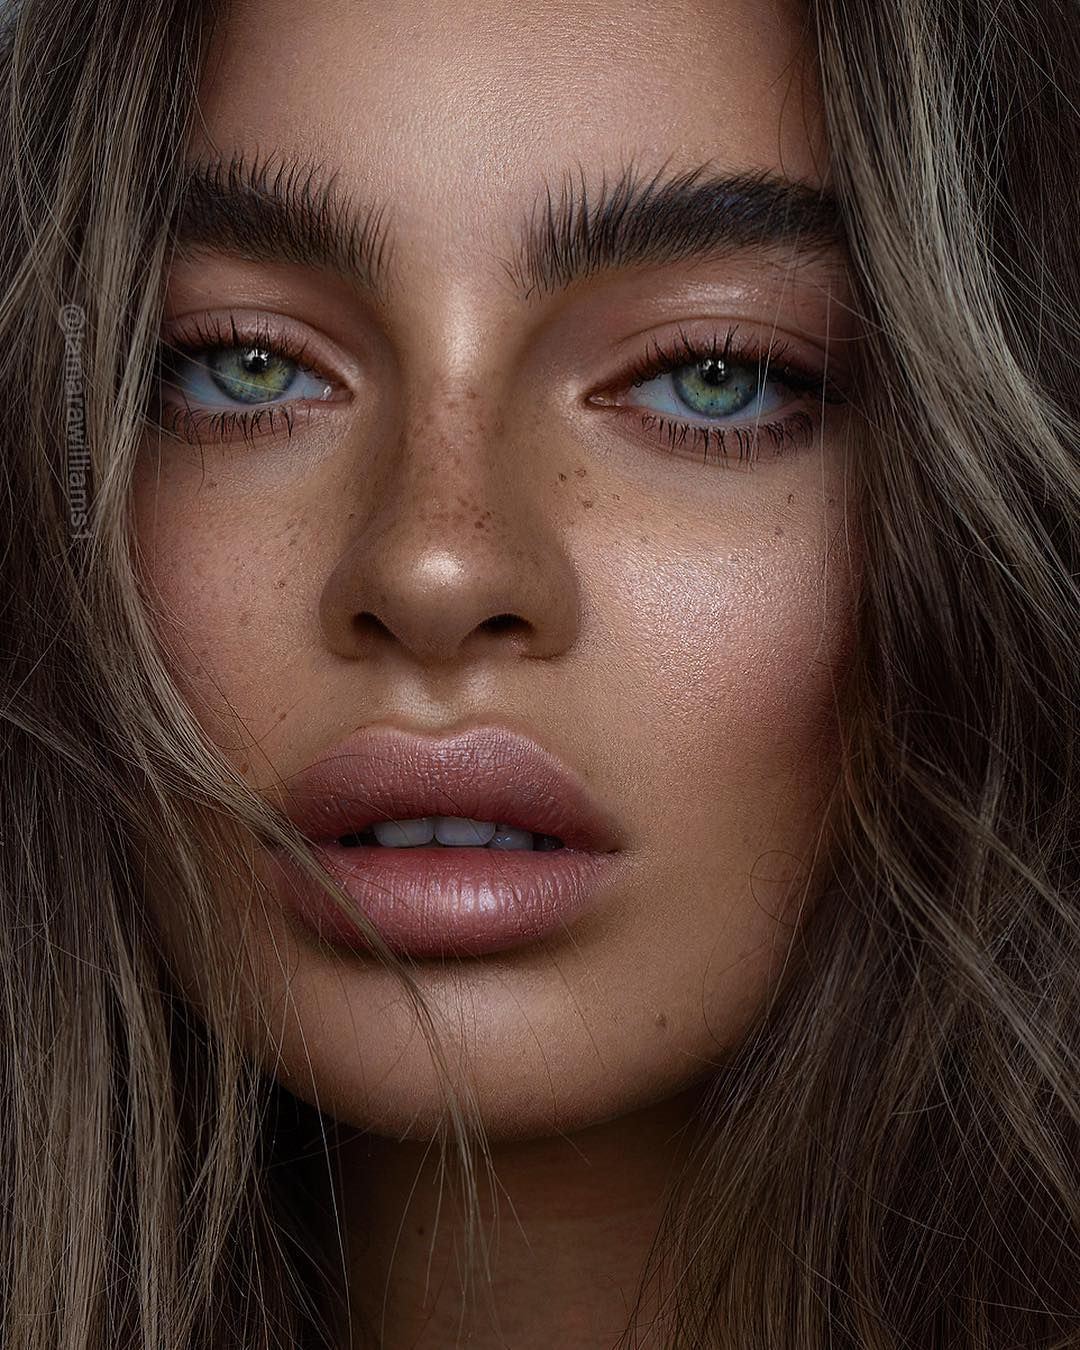 Beauty 2 Fashion: 3,989 отметок «Нравится», 55 комментариев